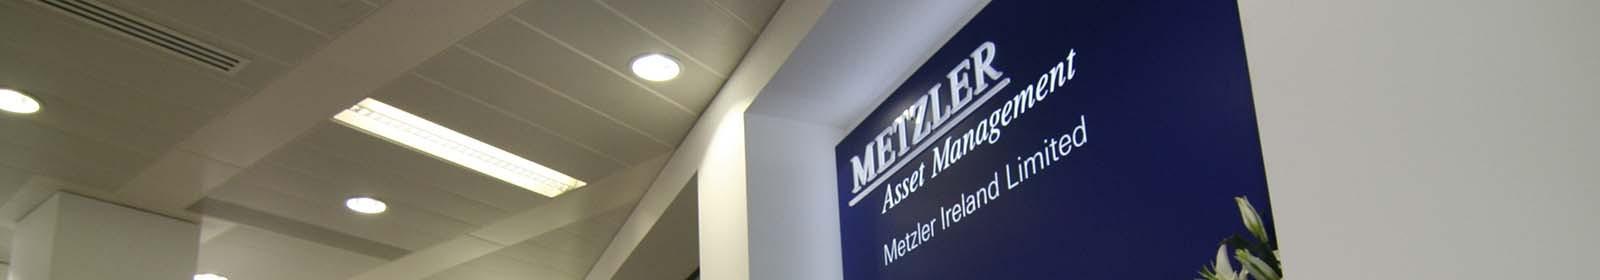 Metzler Asset management Signage